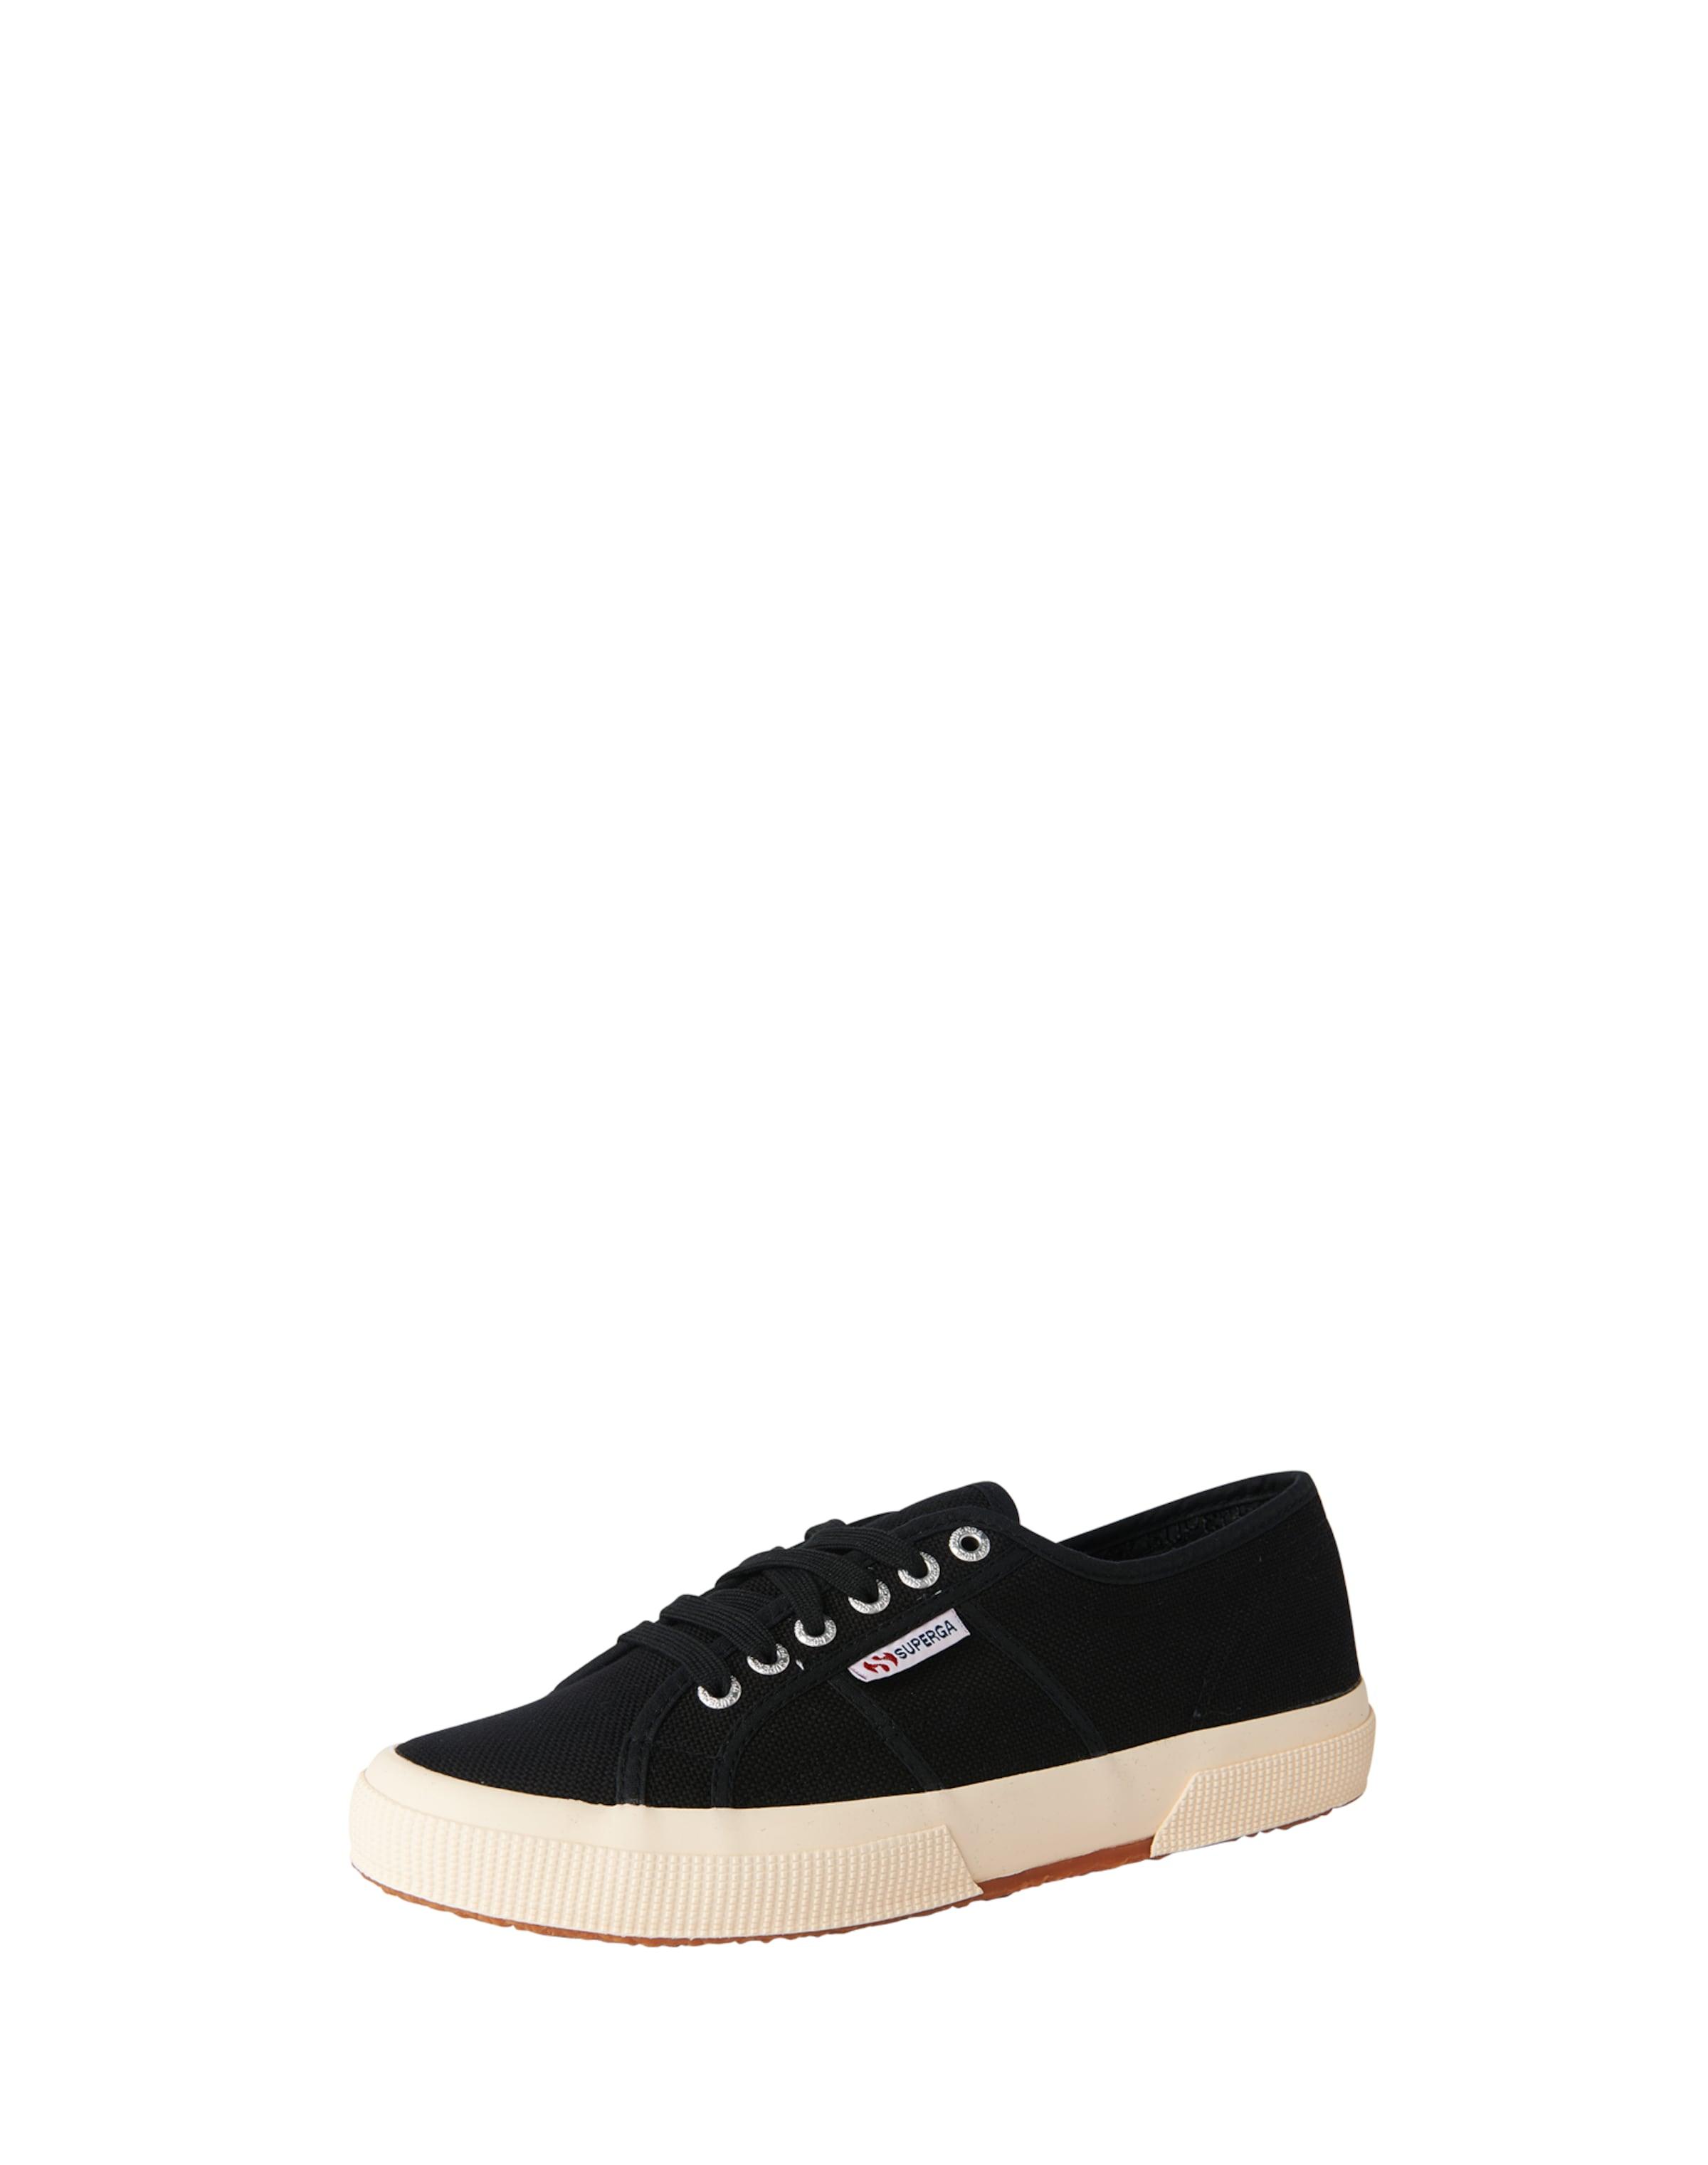 SUPERGA Canvas Sneaker  2750 Cotu Classic